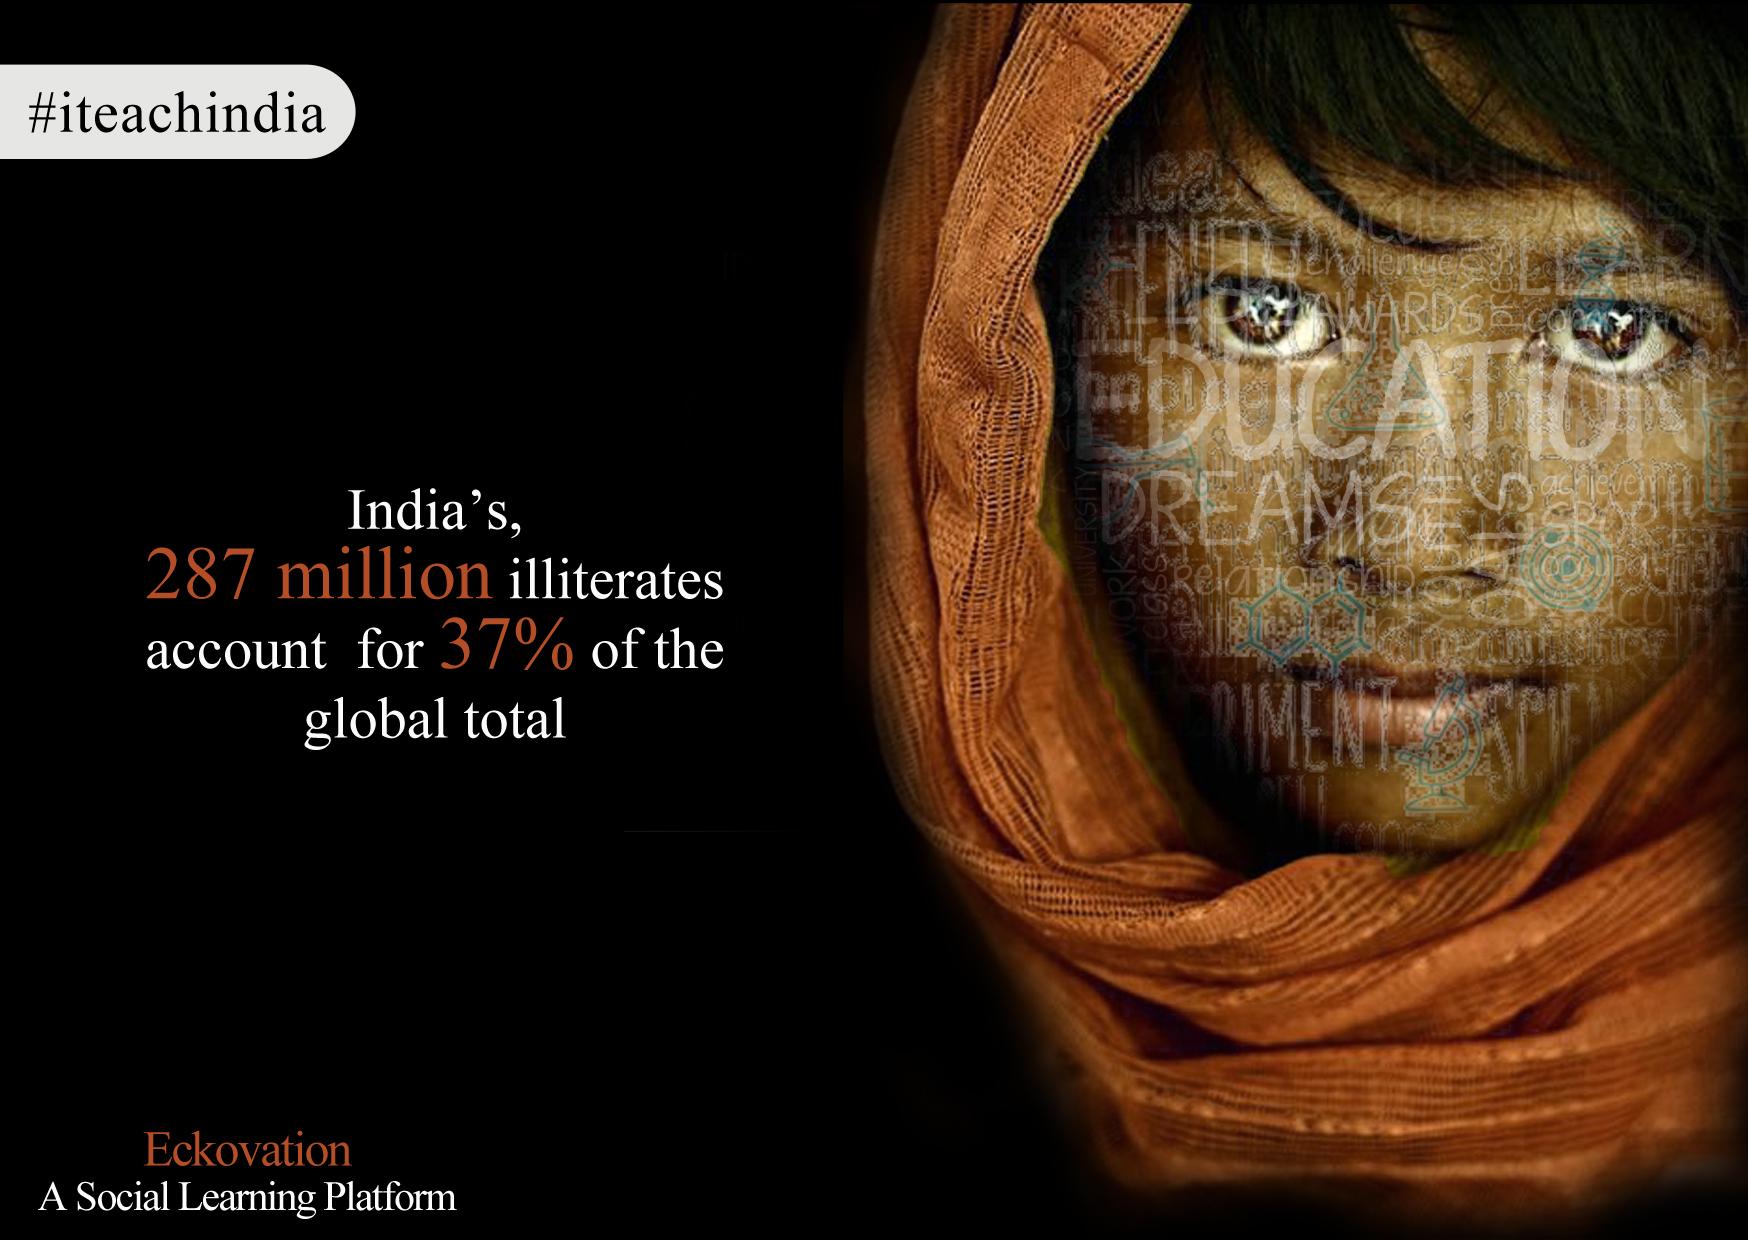 #ITeachIndia